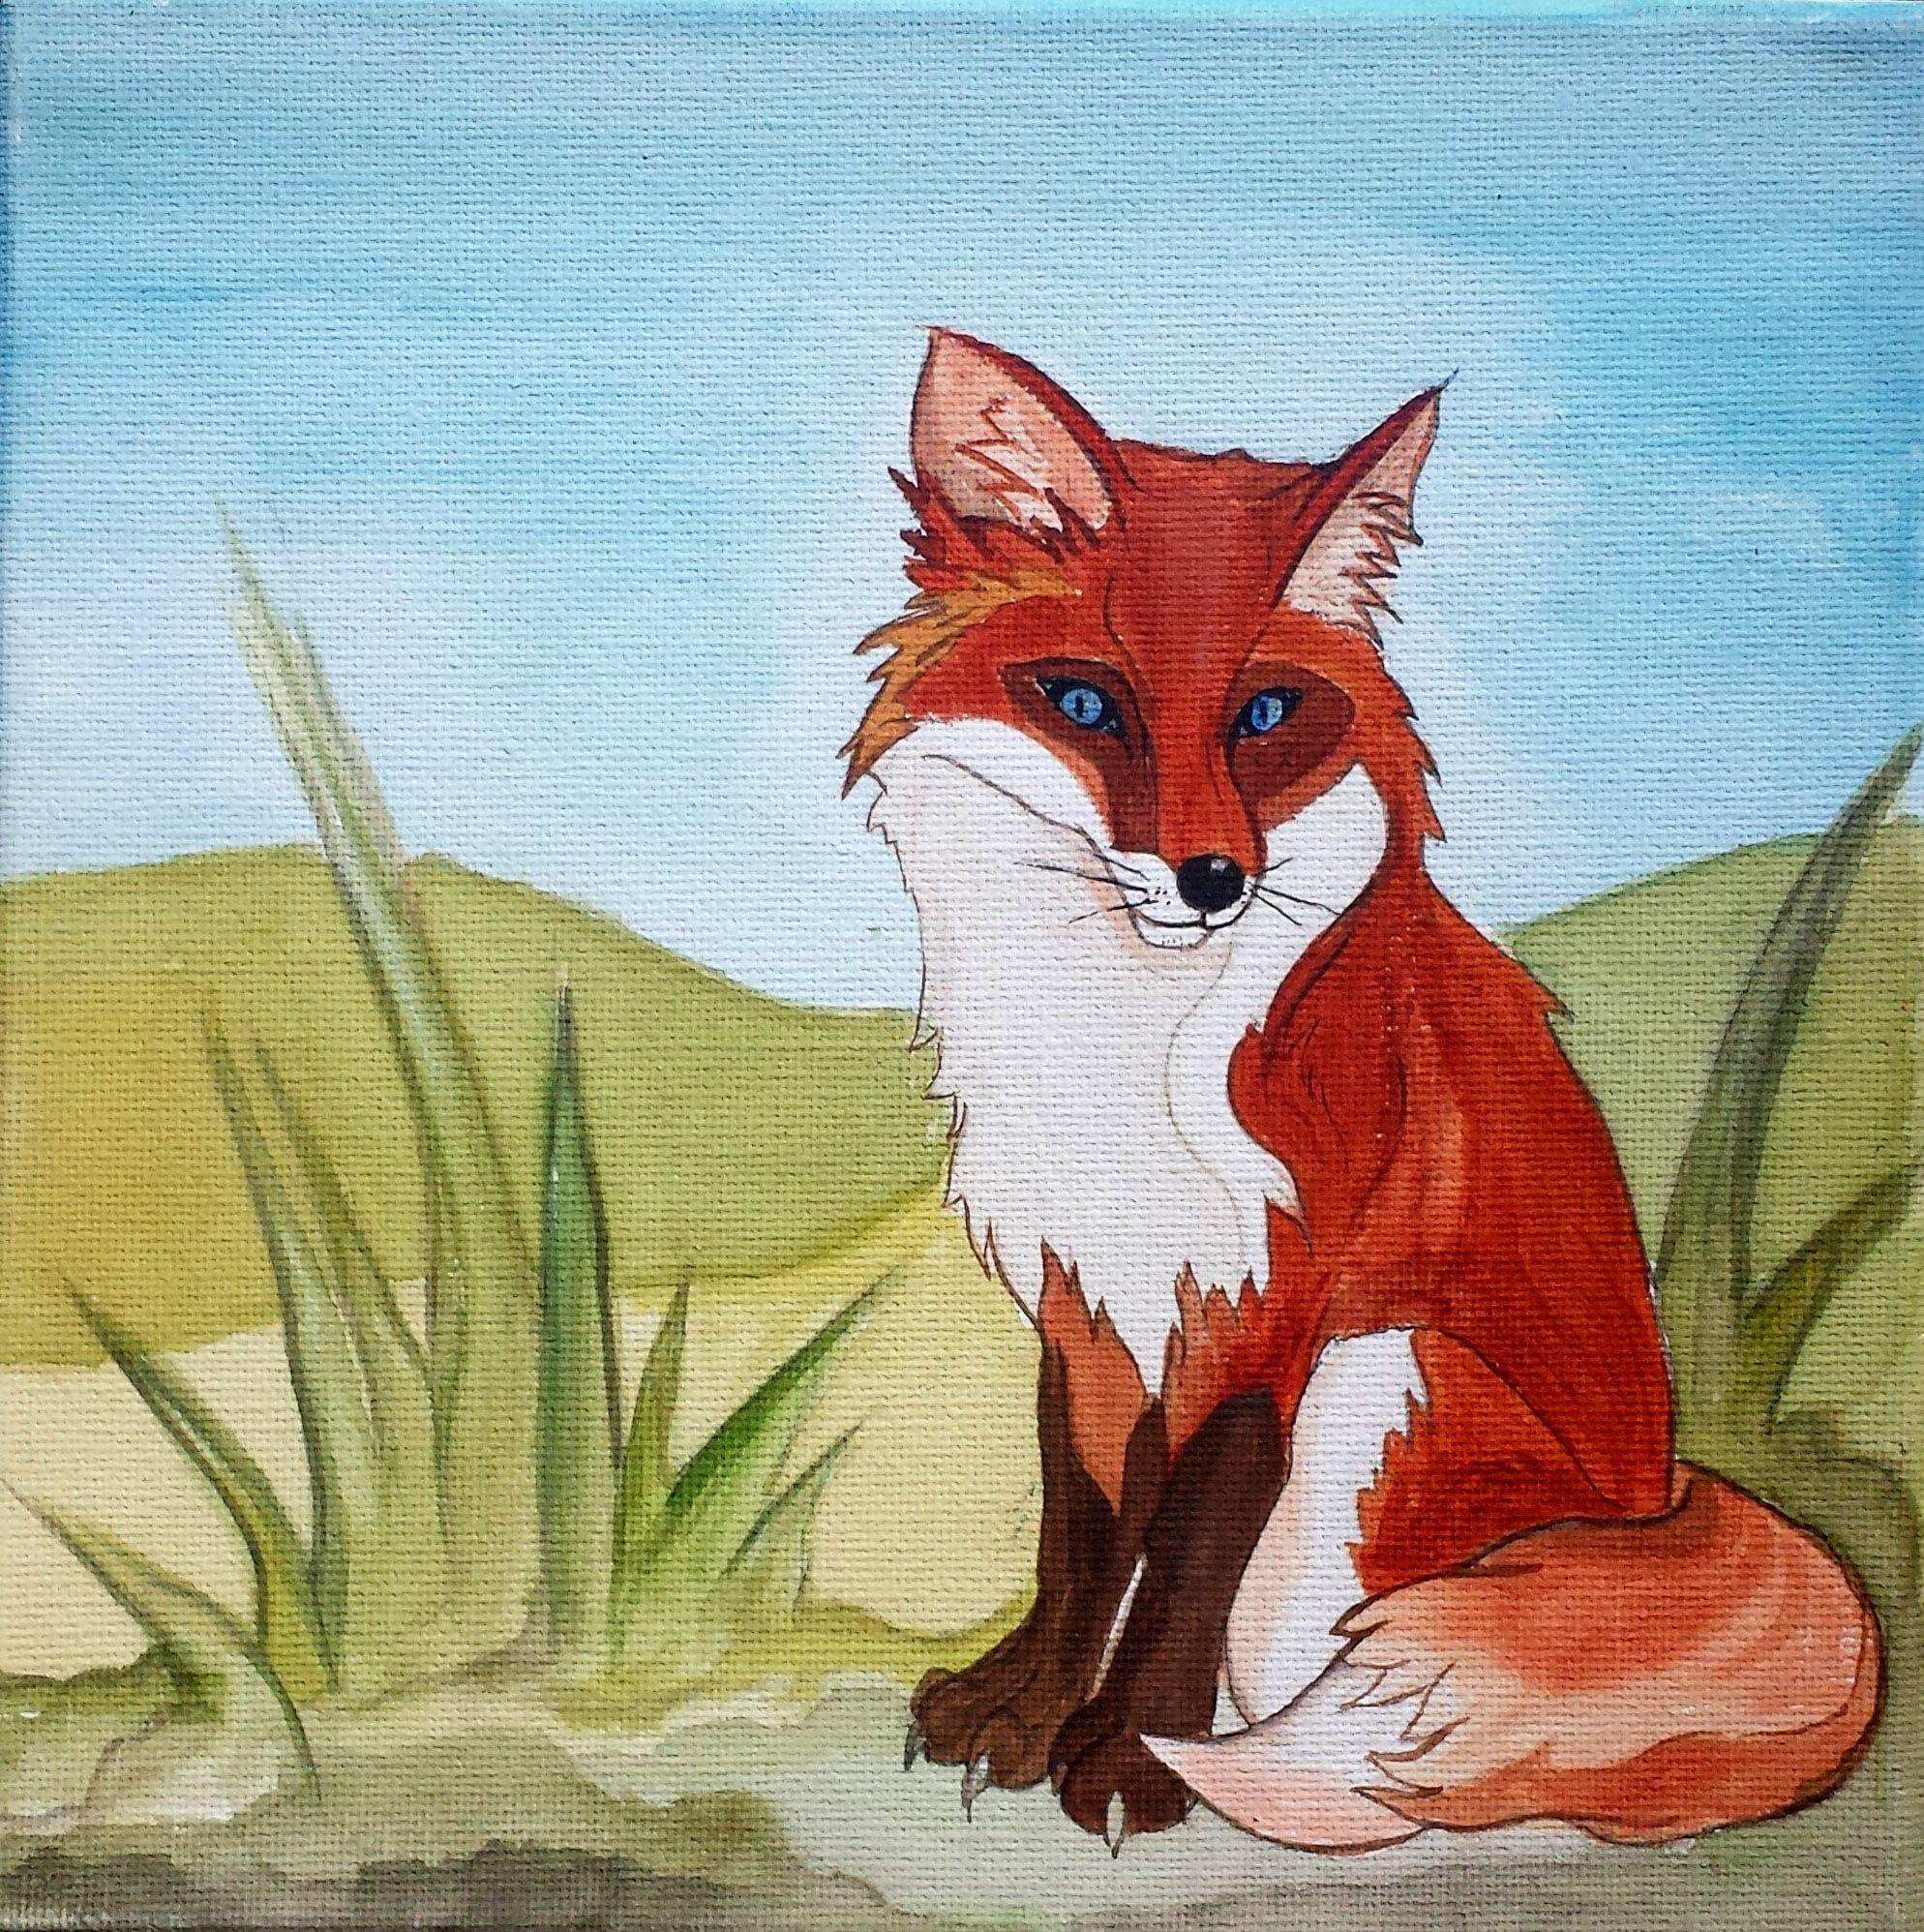 Edvard the Fox watercolour on canvas